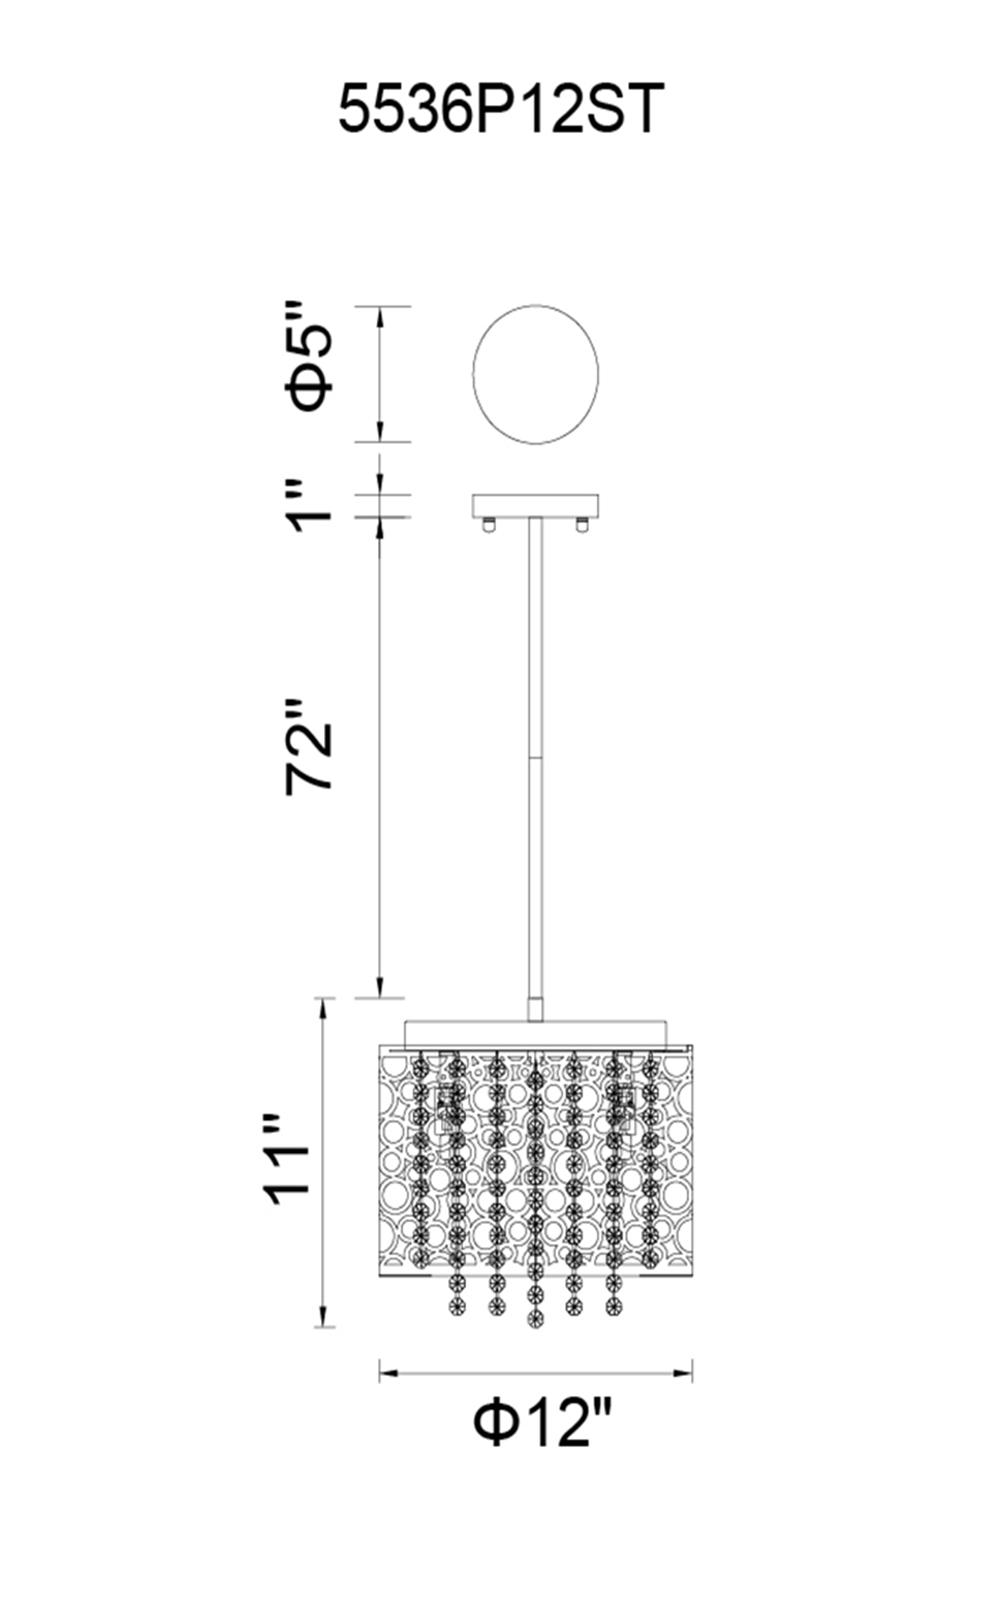 CWI Lighting Bubbles 4 Light Drum Shade Mini Pendant With Chrome Model: 5536P12ST Line Drawing